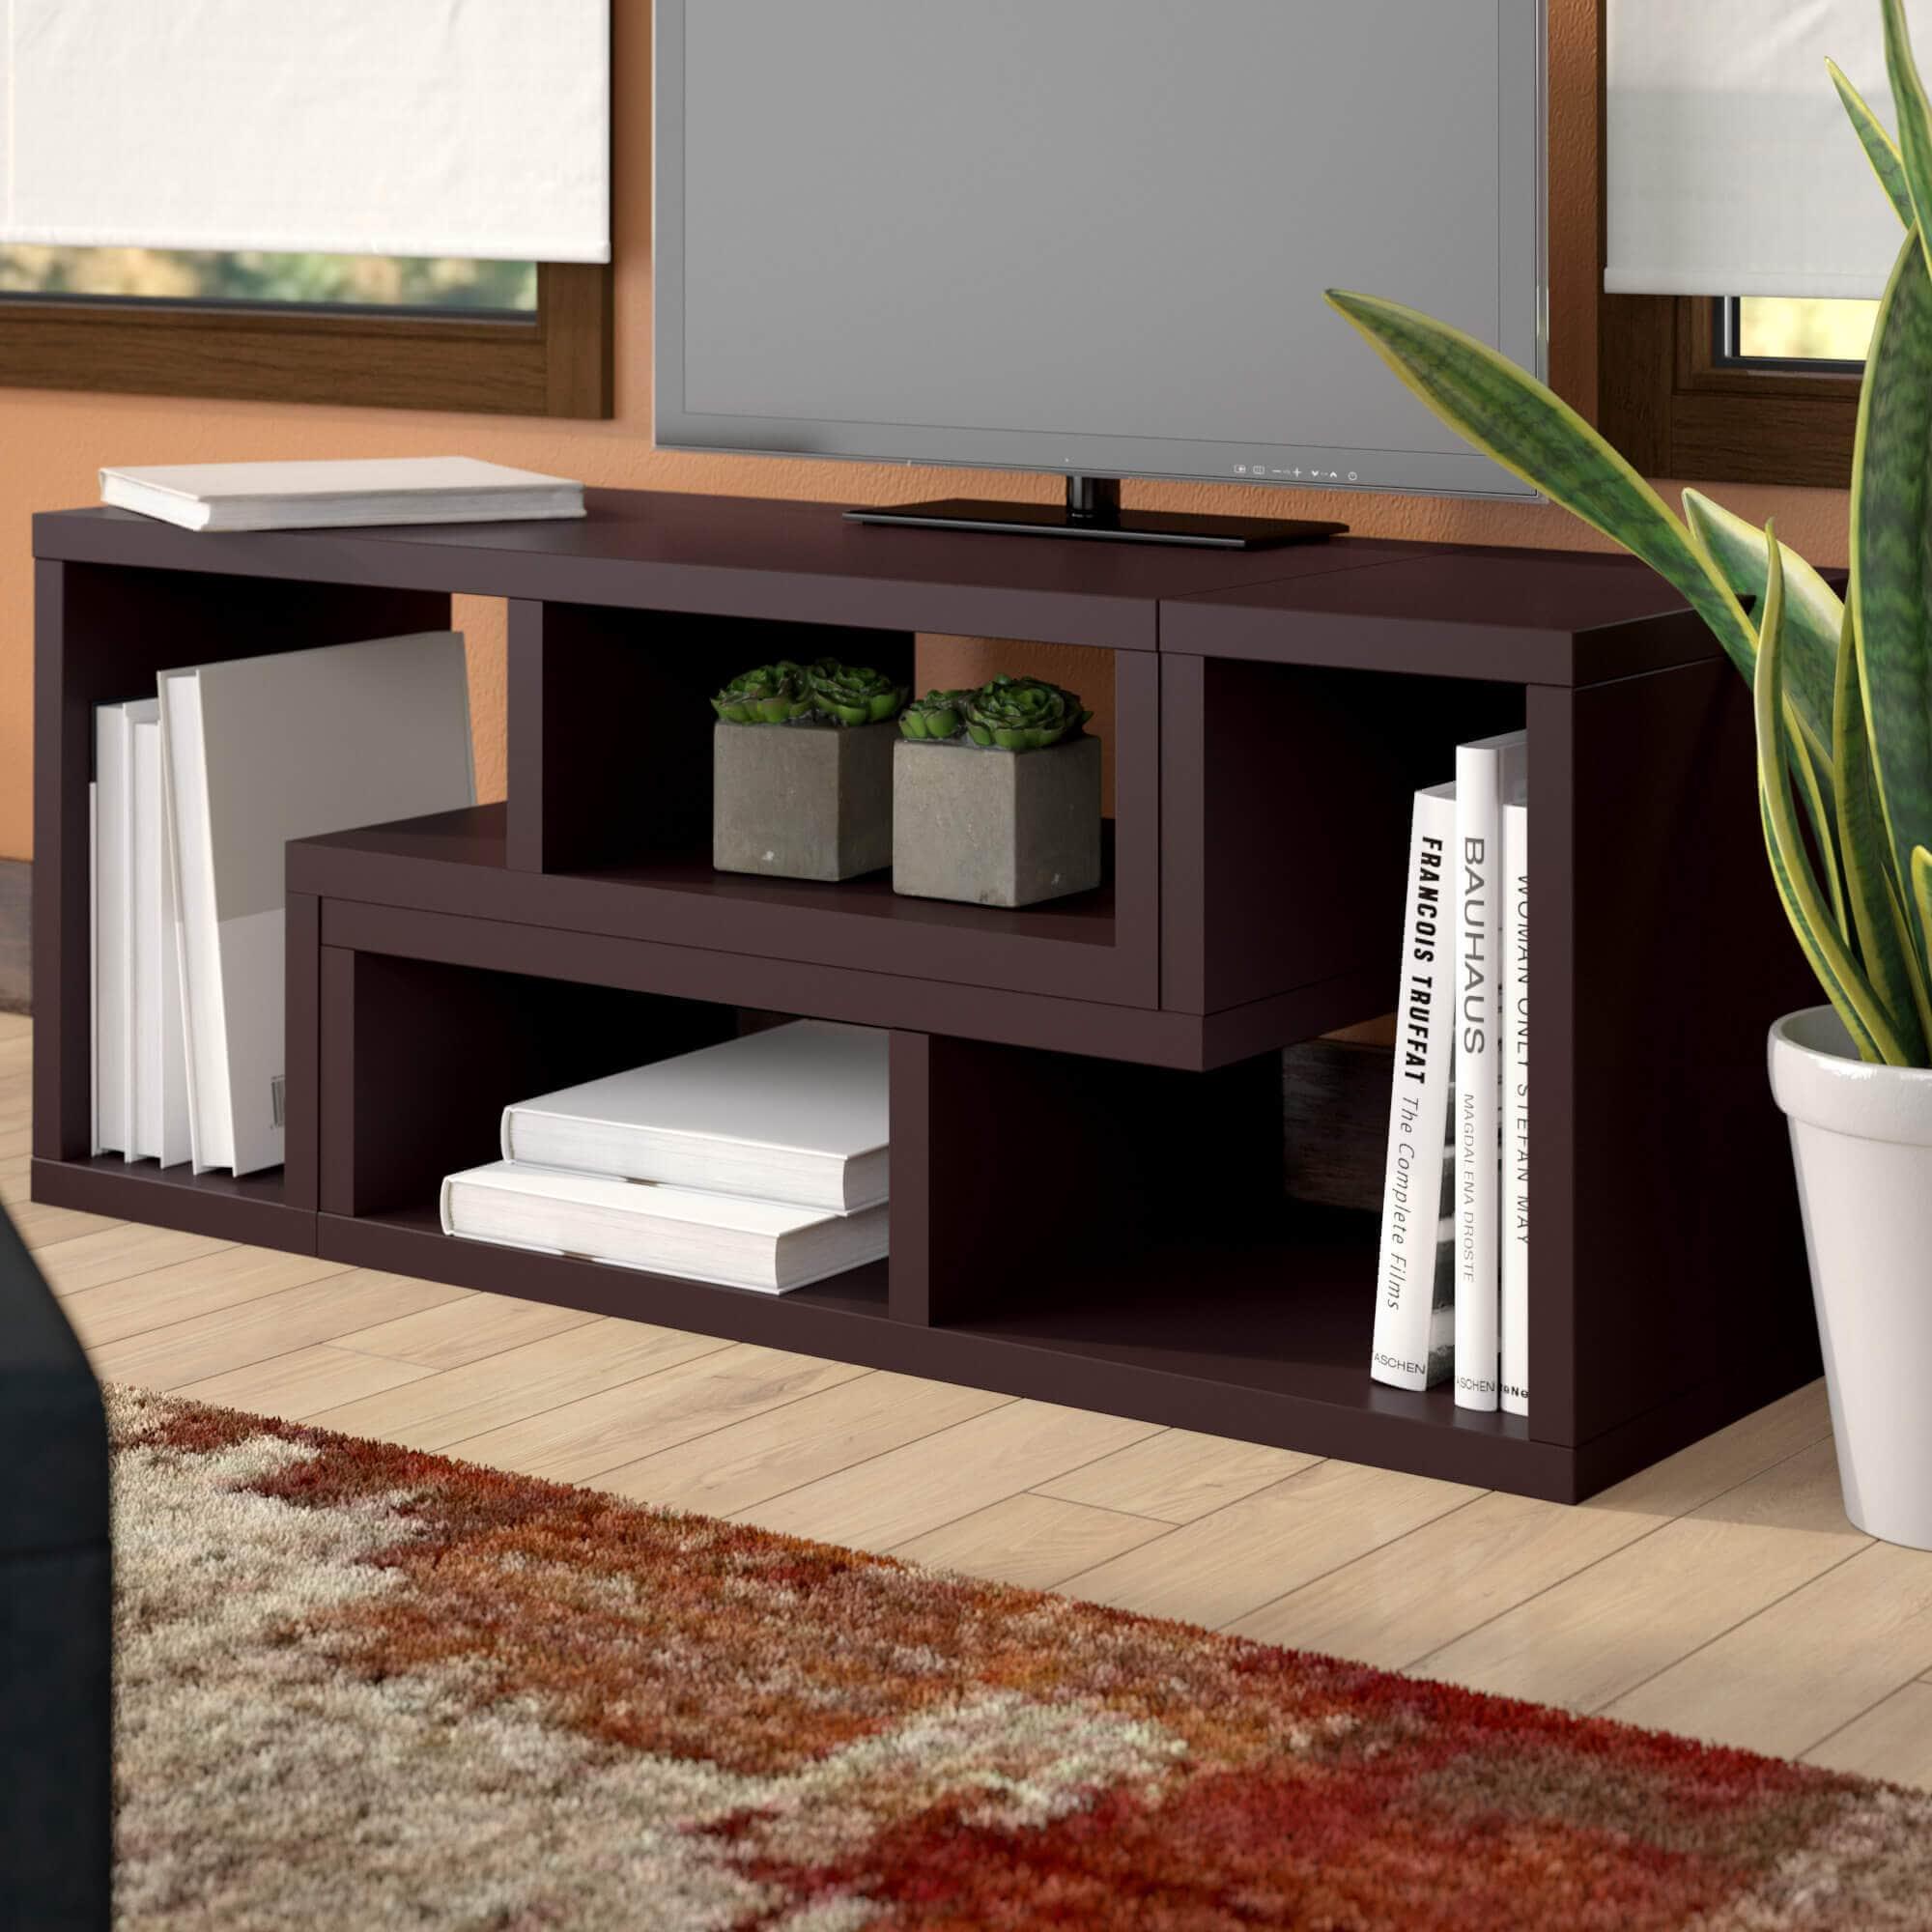 TV Stand Design